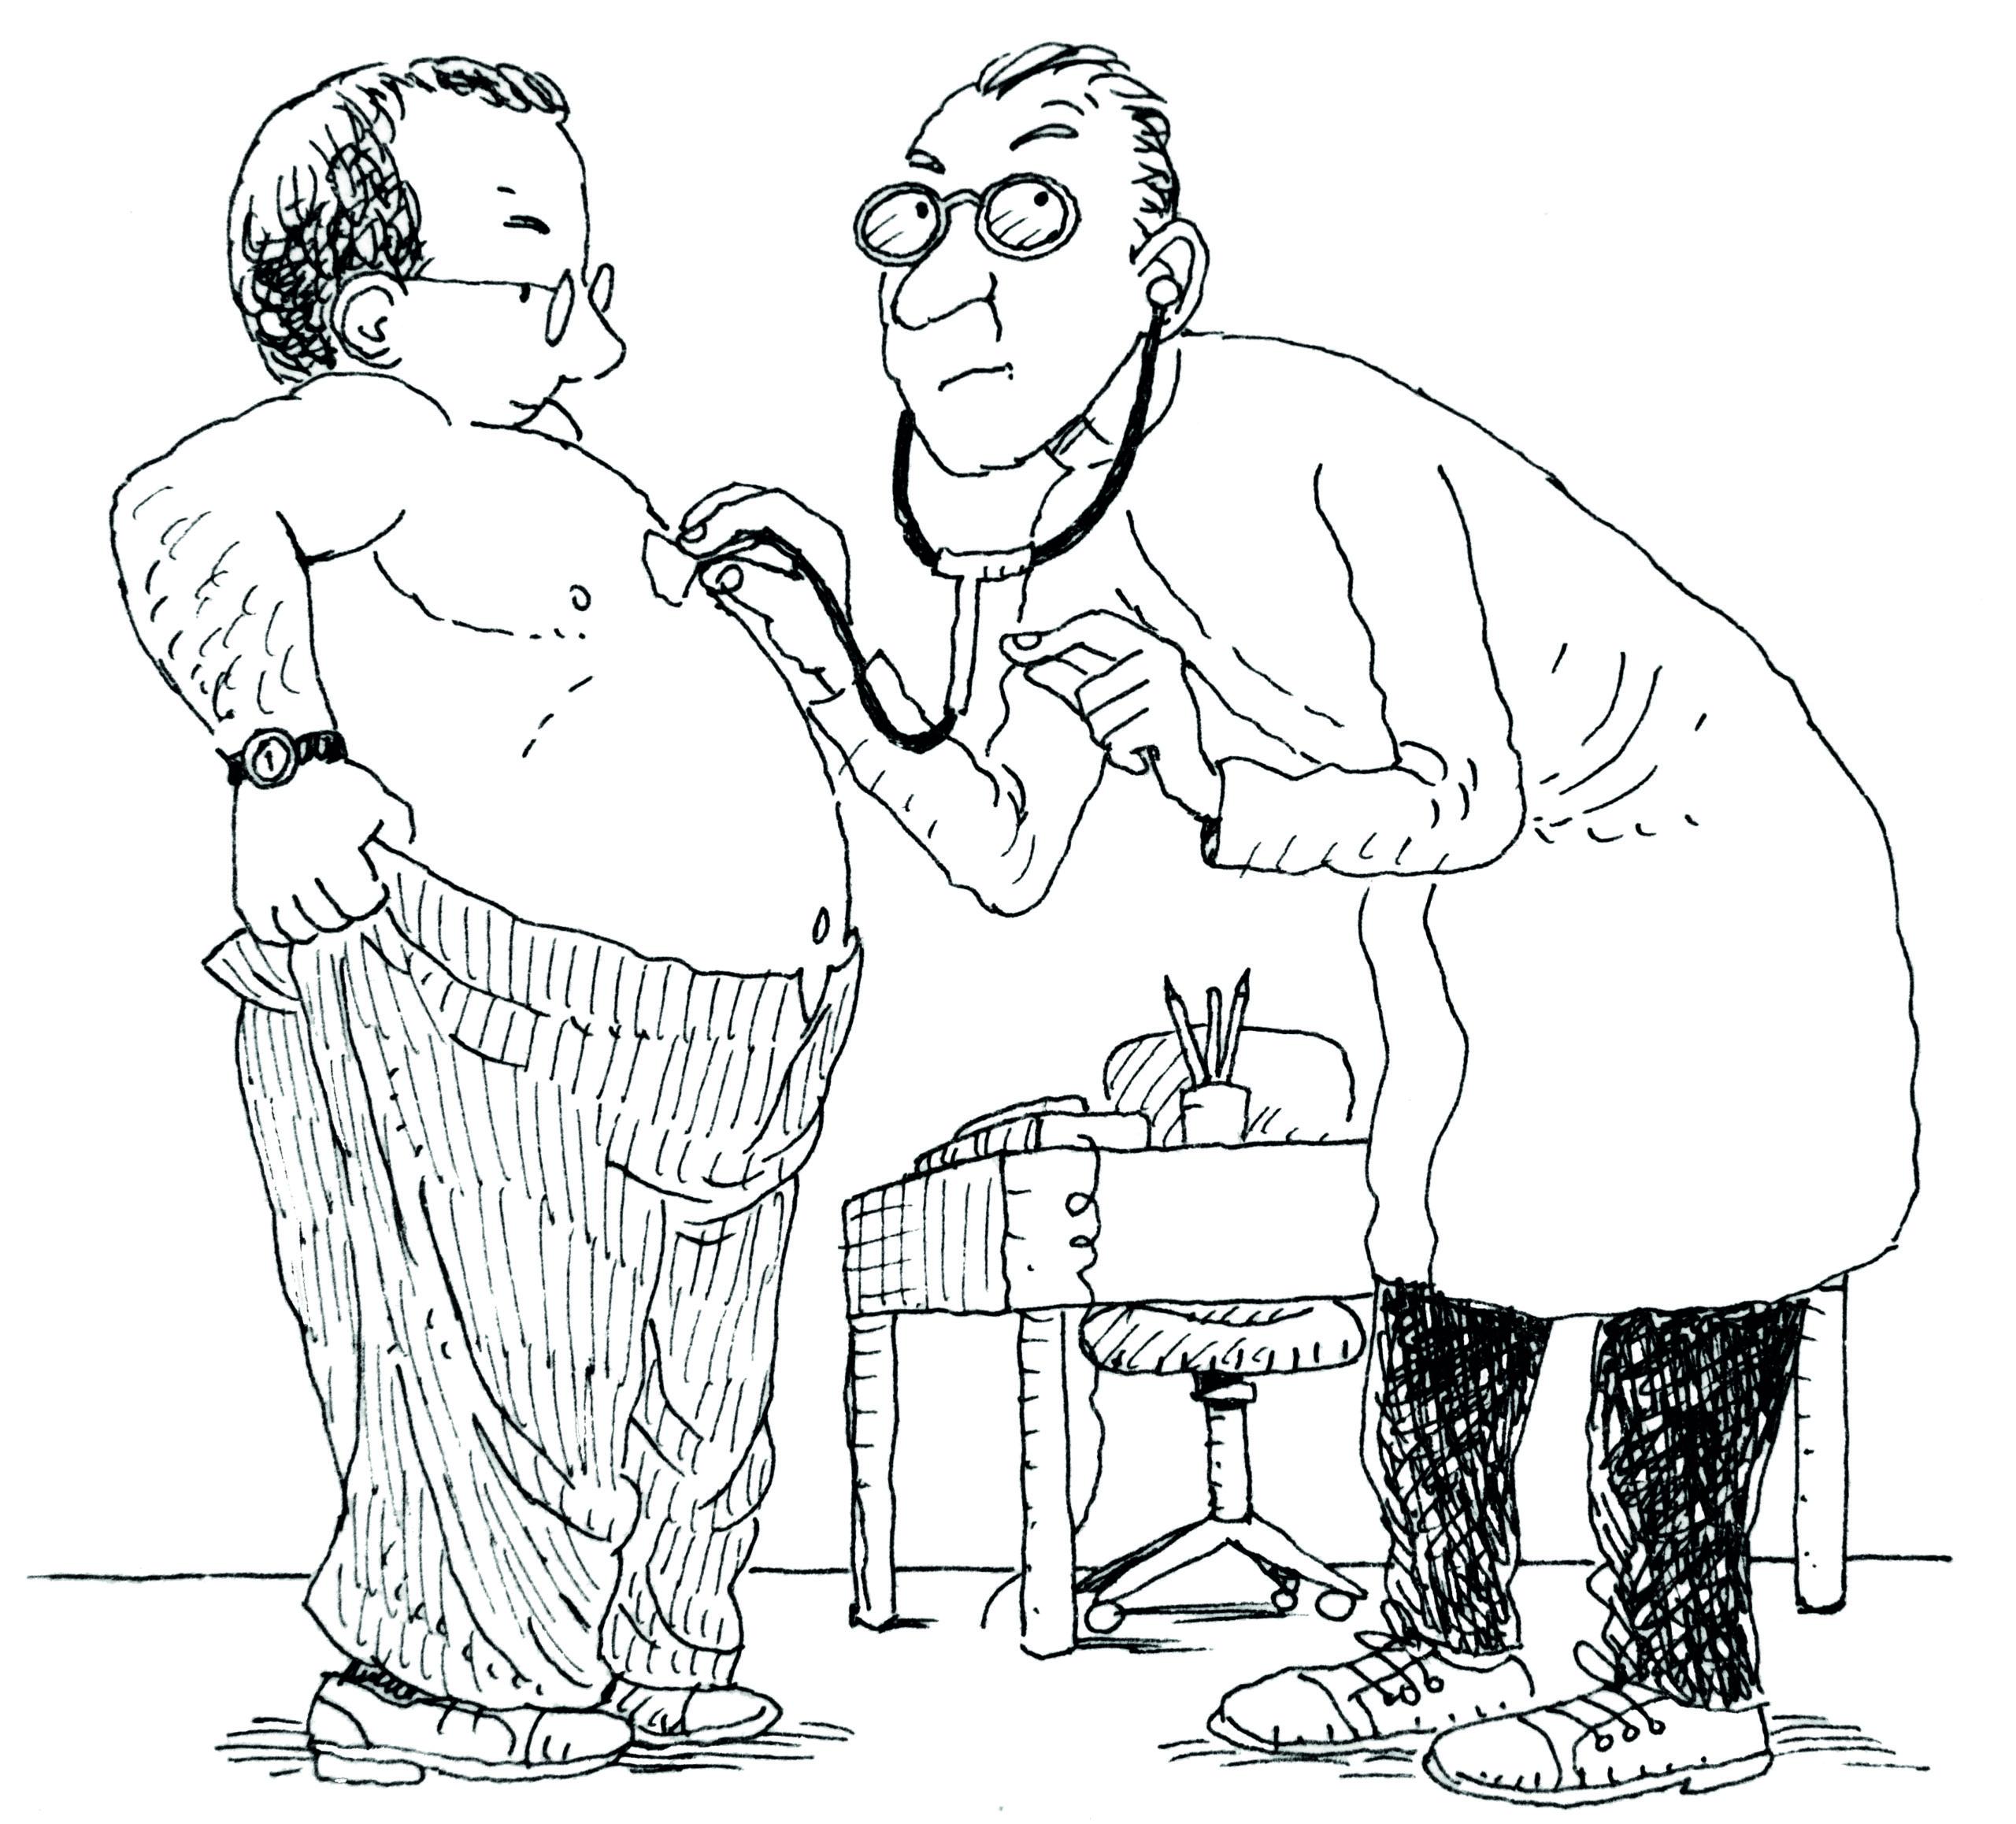 teveel dokters in wallonië